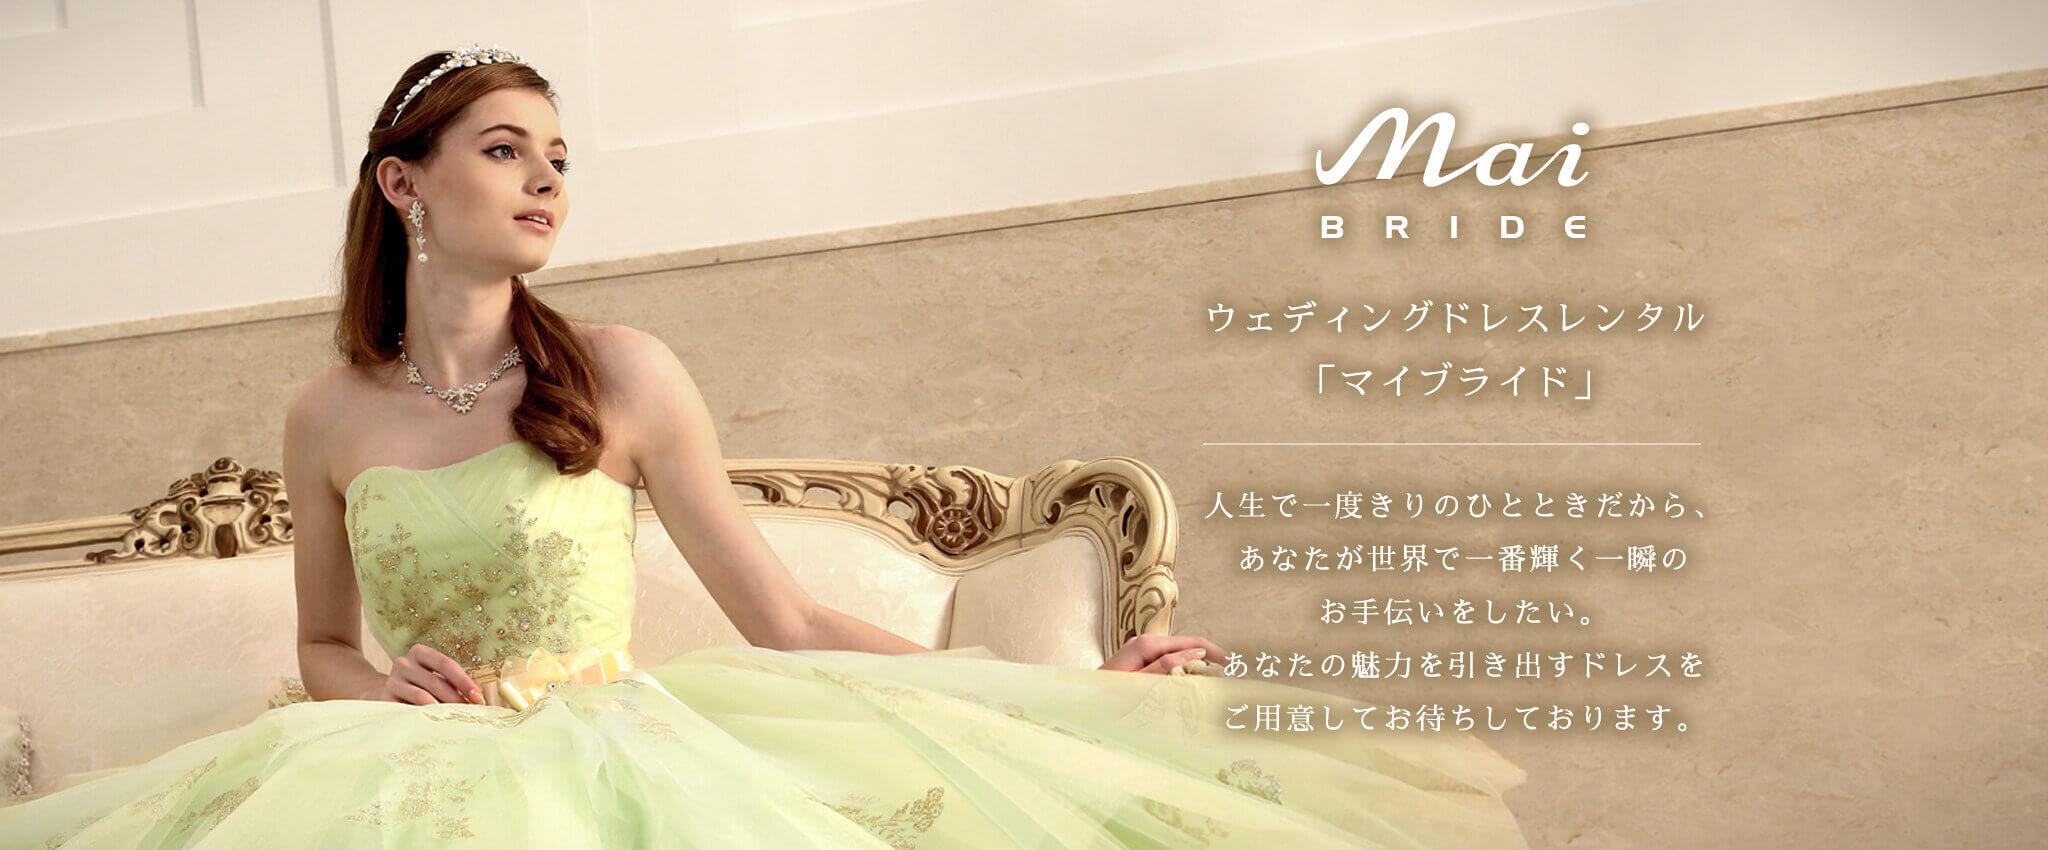 ece45f7b8f6b6 ウエディングドレスレンタル「Mai BRIDE」 ...